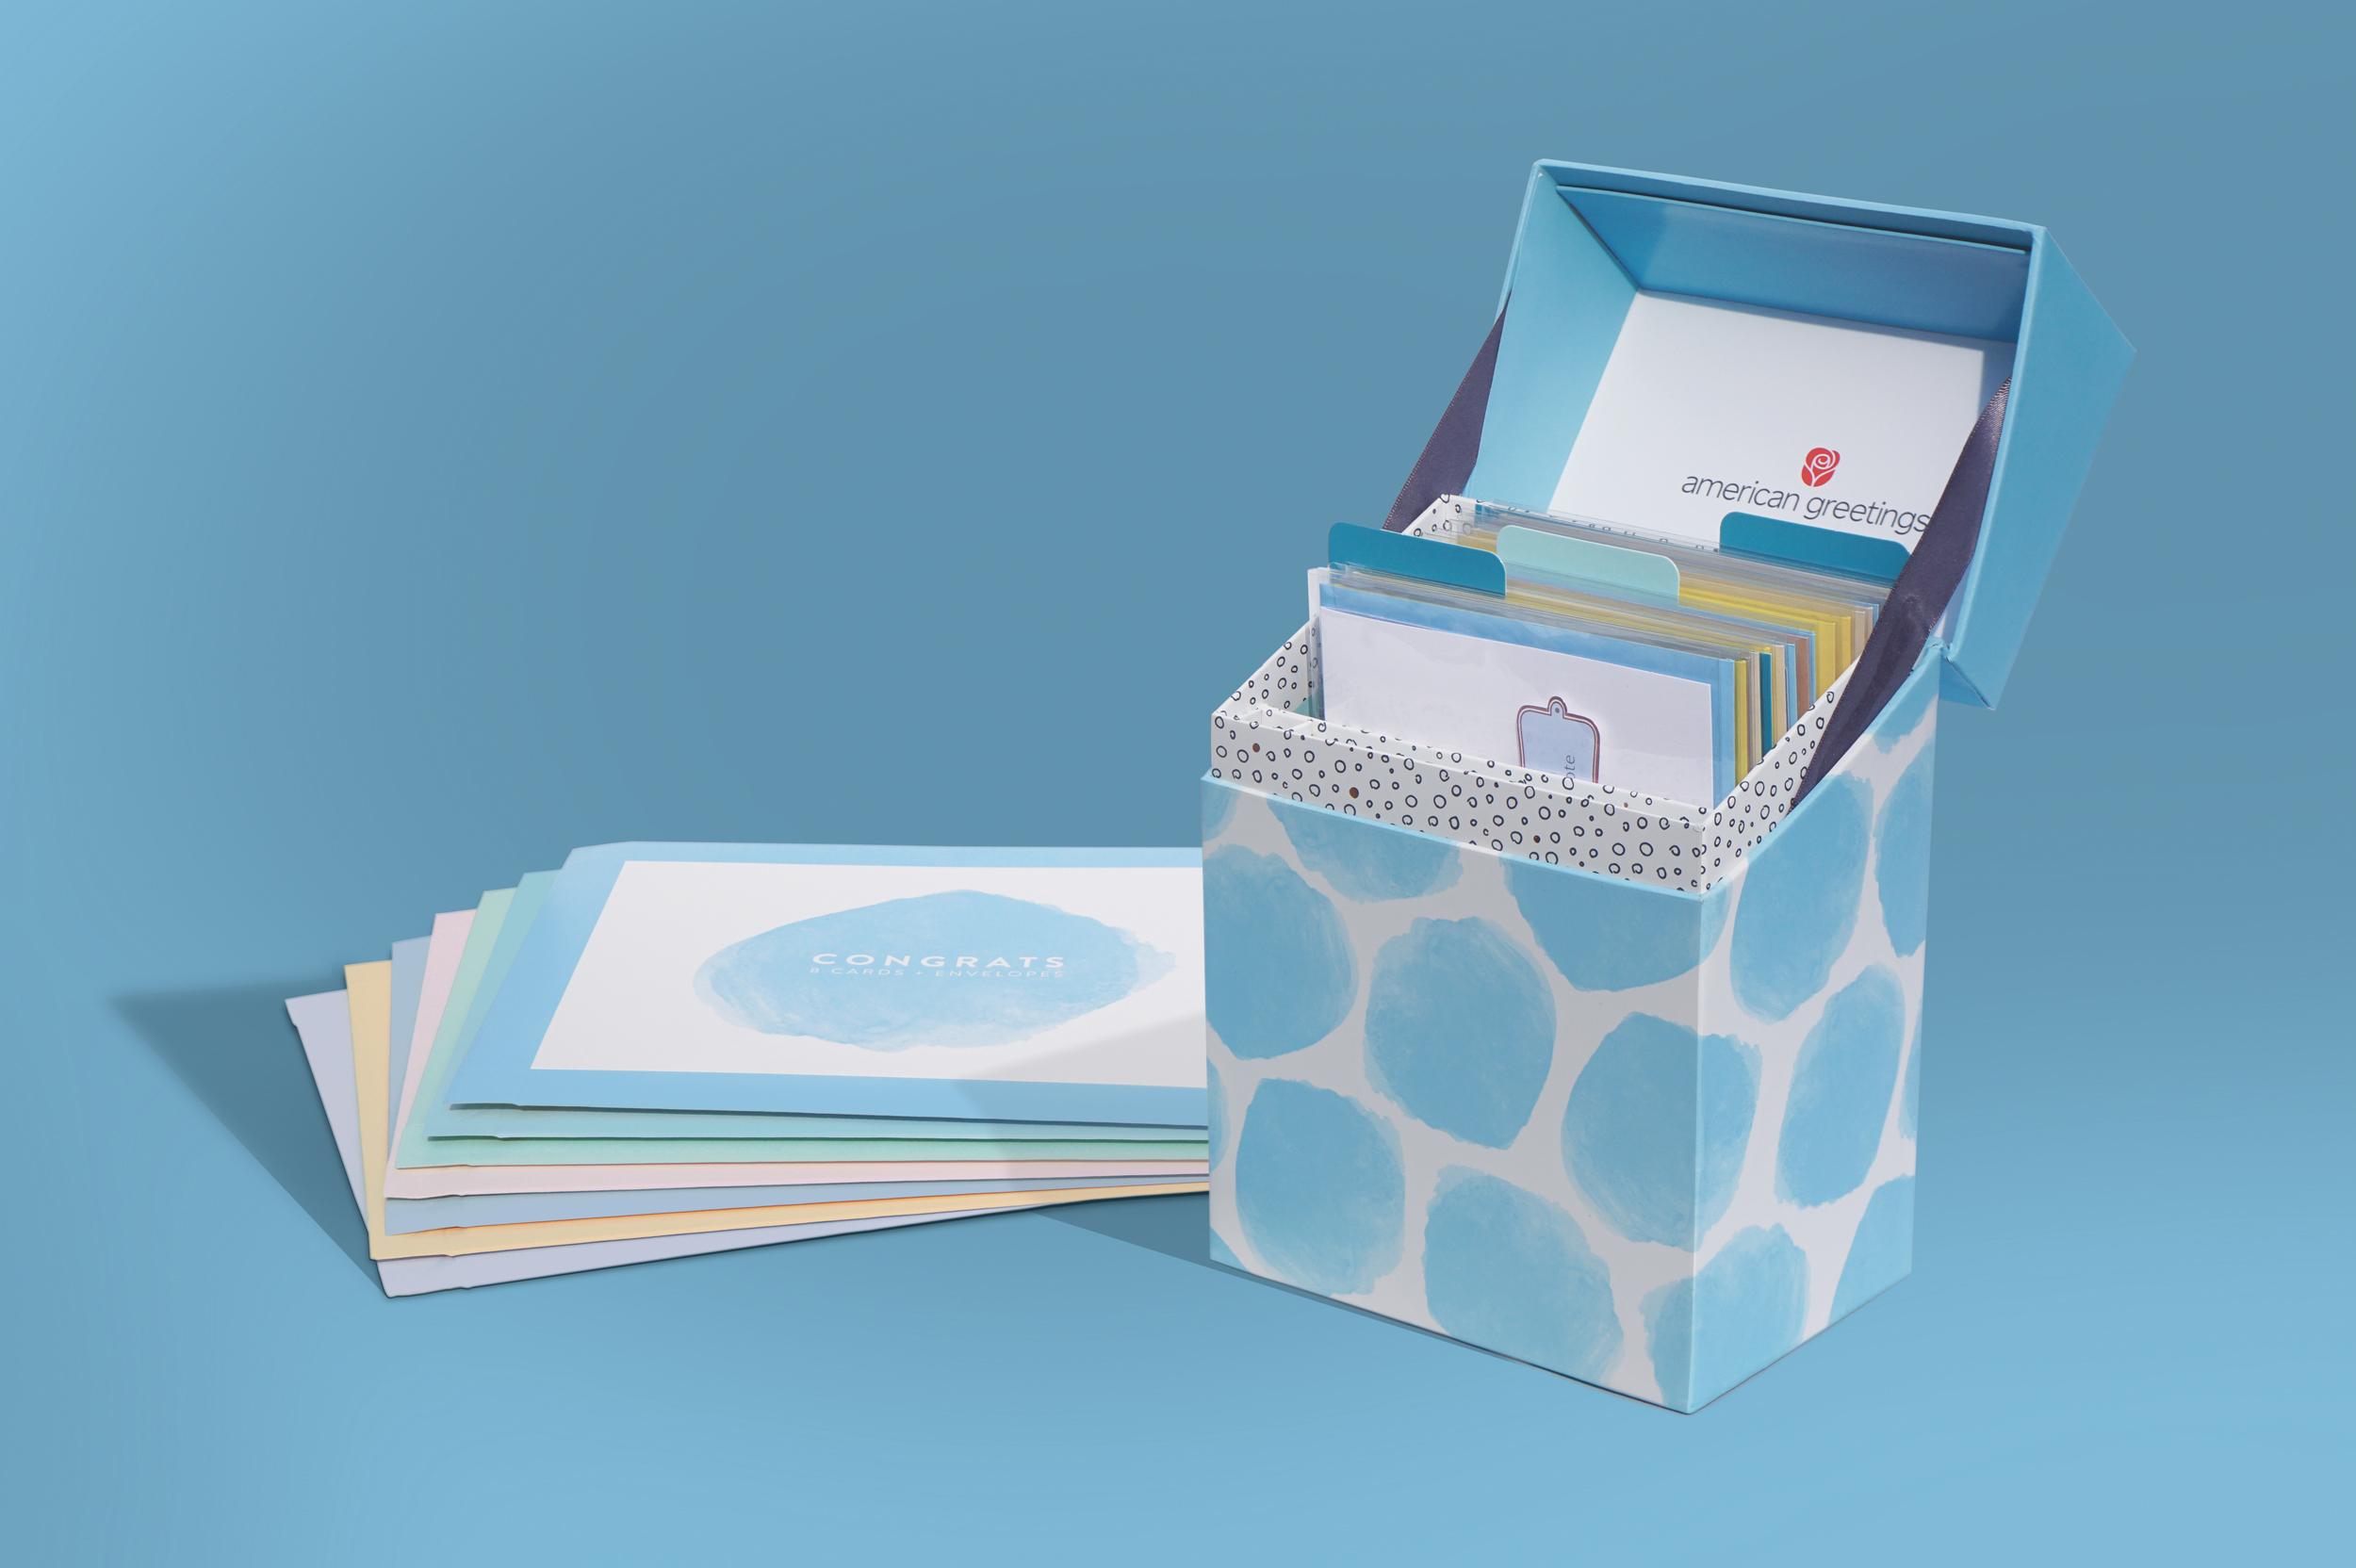 greeting_card_box_with_envelopes.jpg